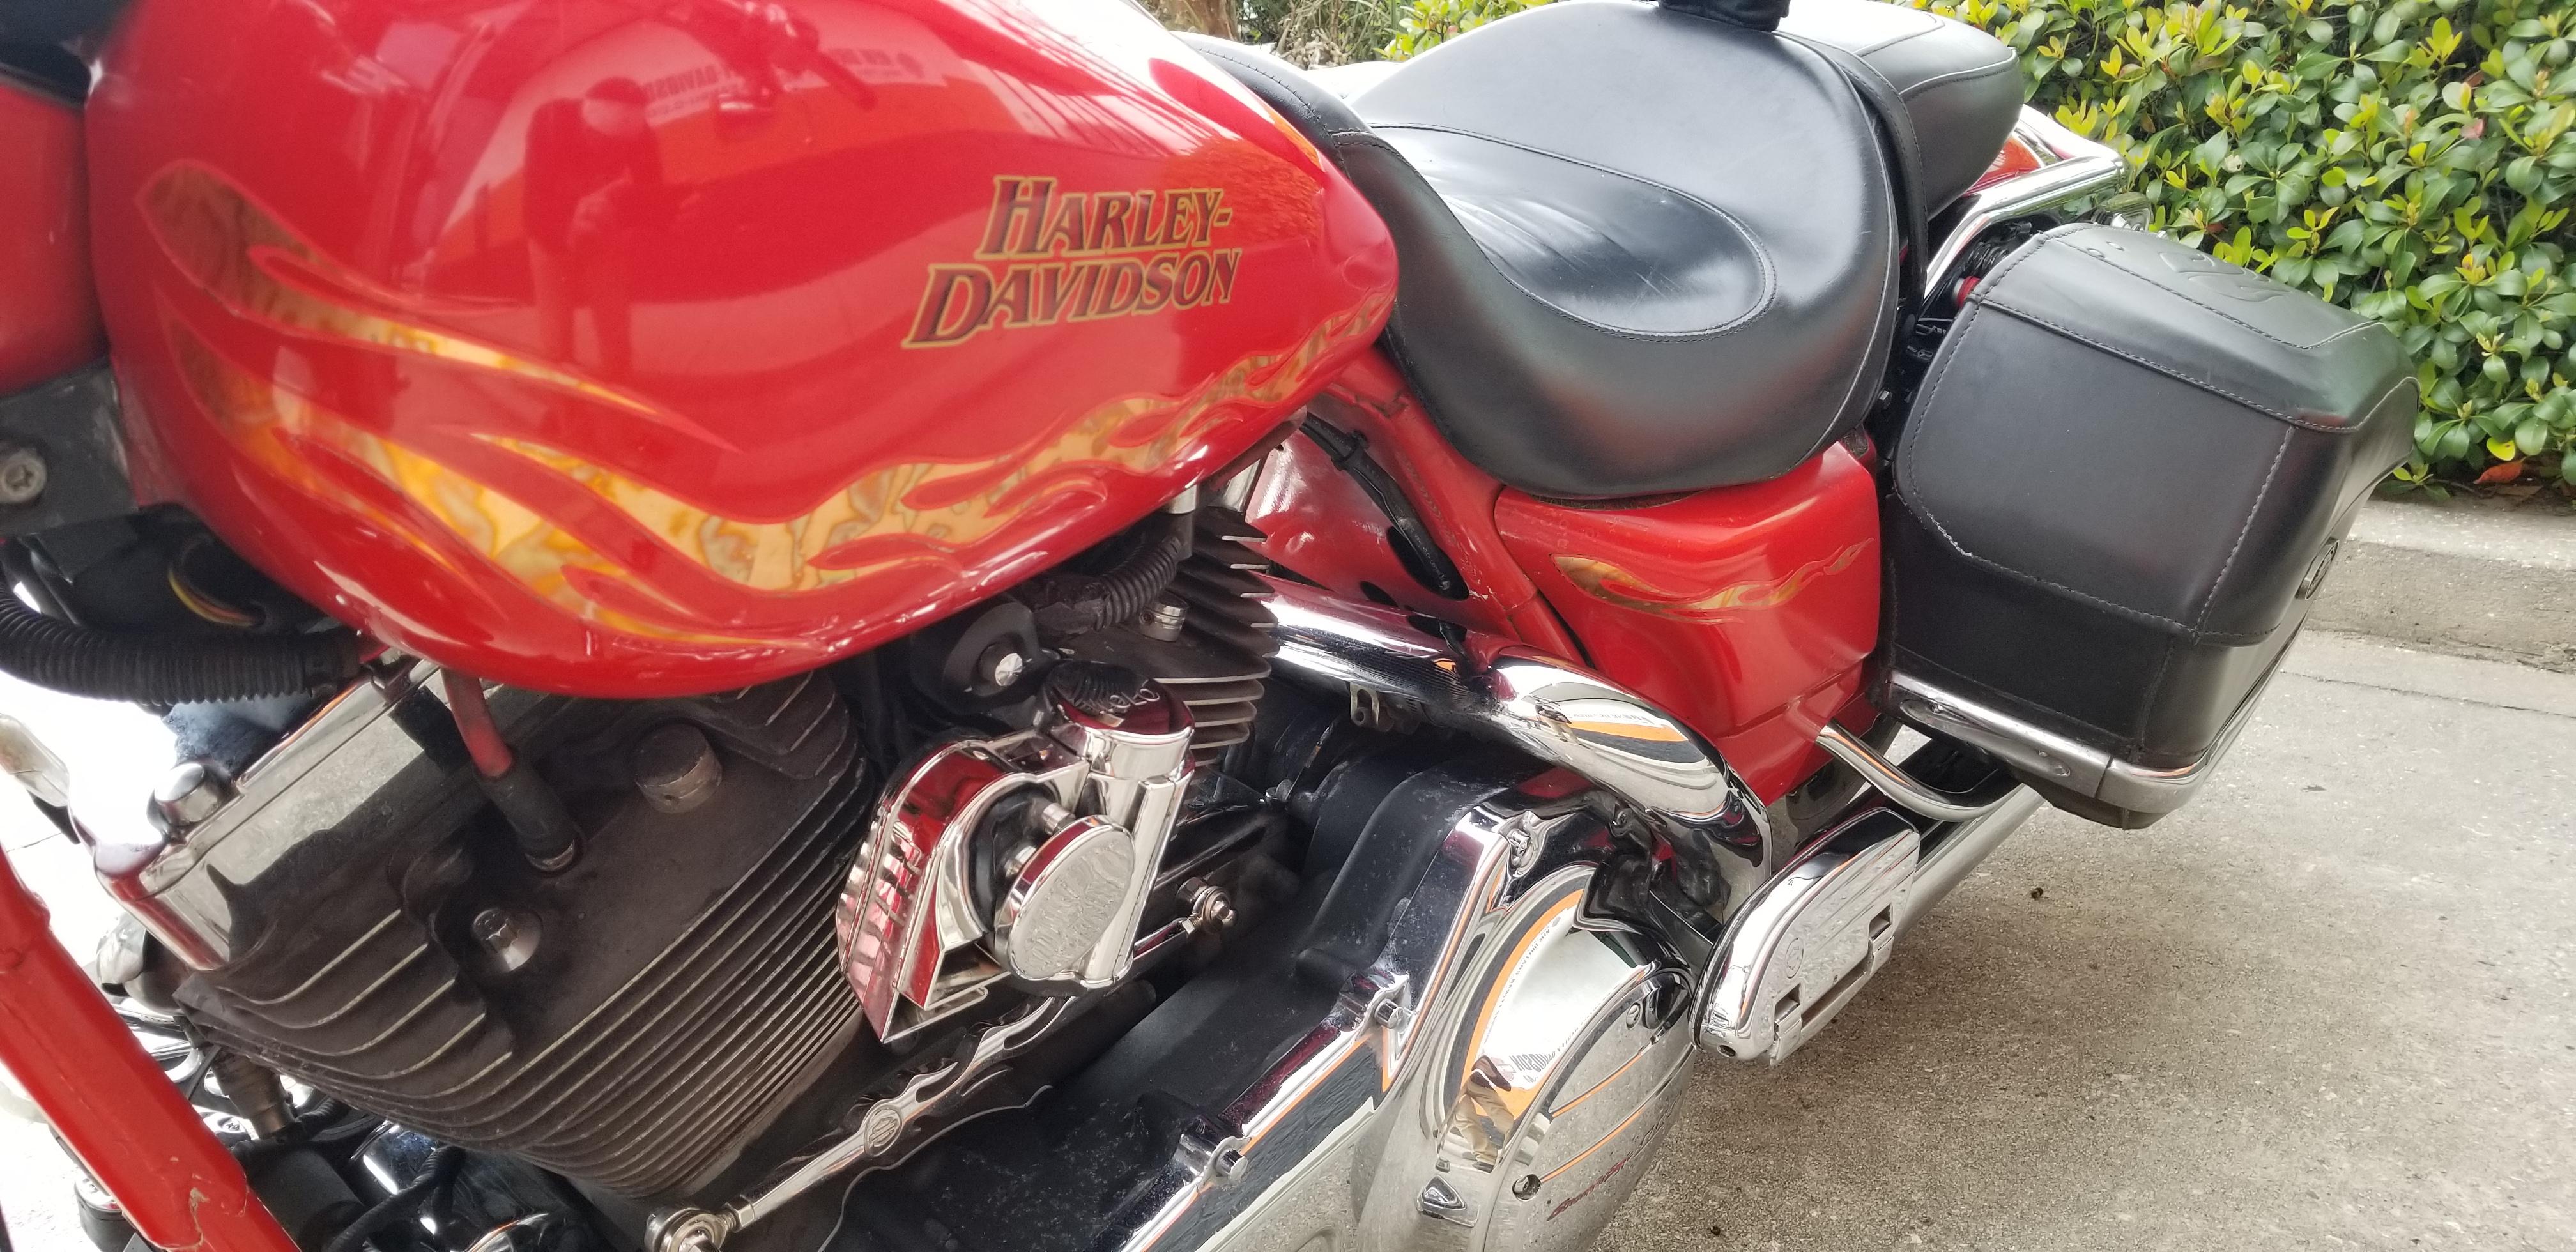 Pre-Owned 2007 Harley-Davidson Screamin Eagle Road King